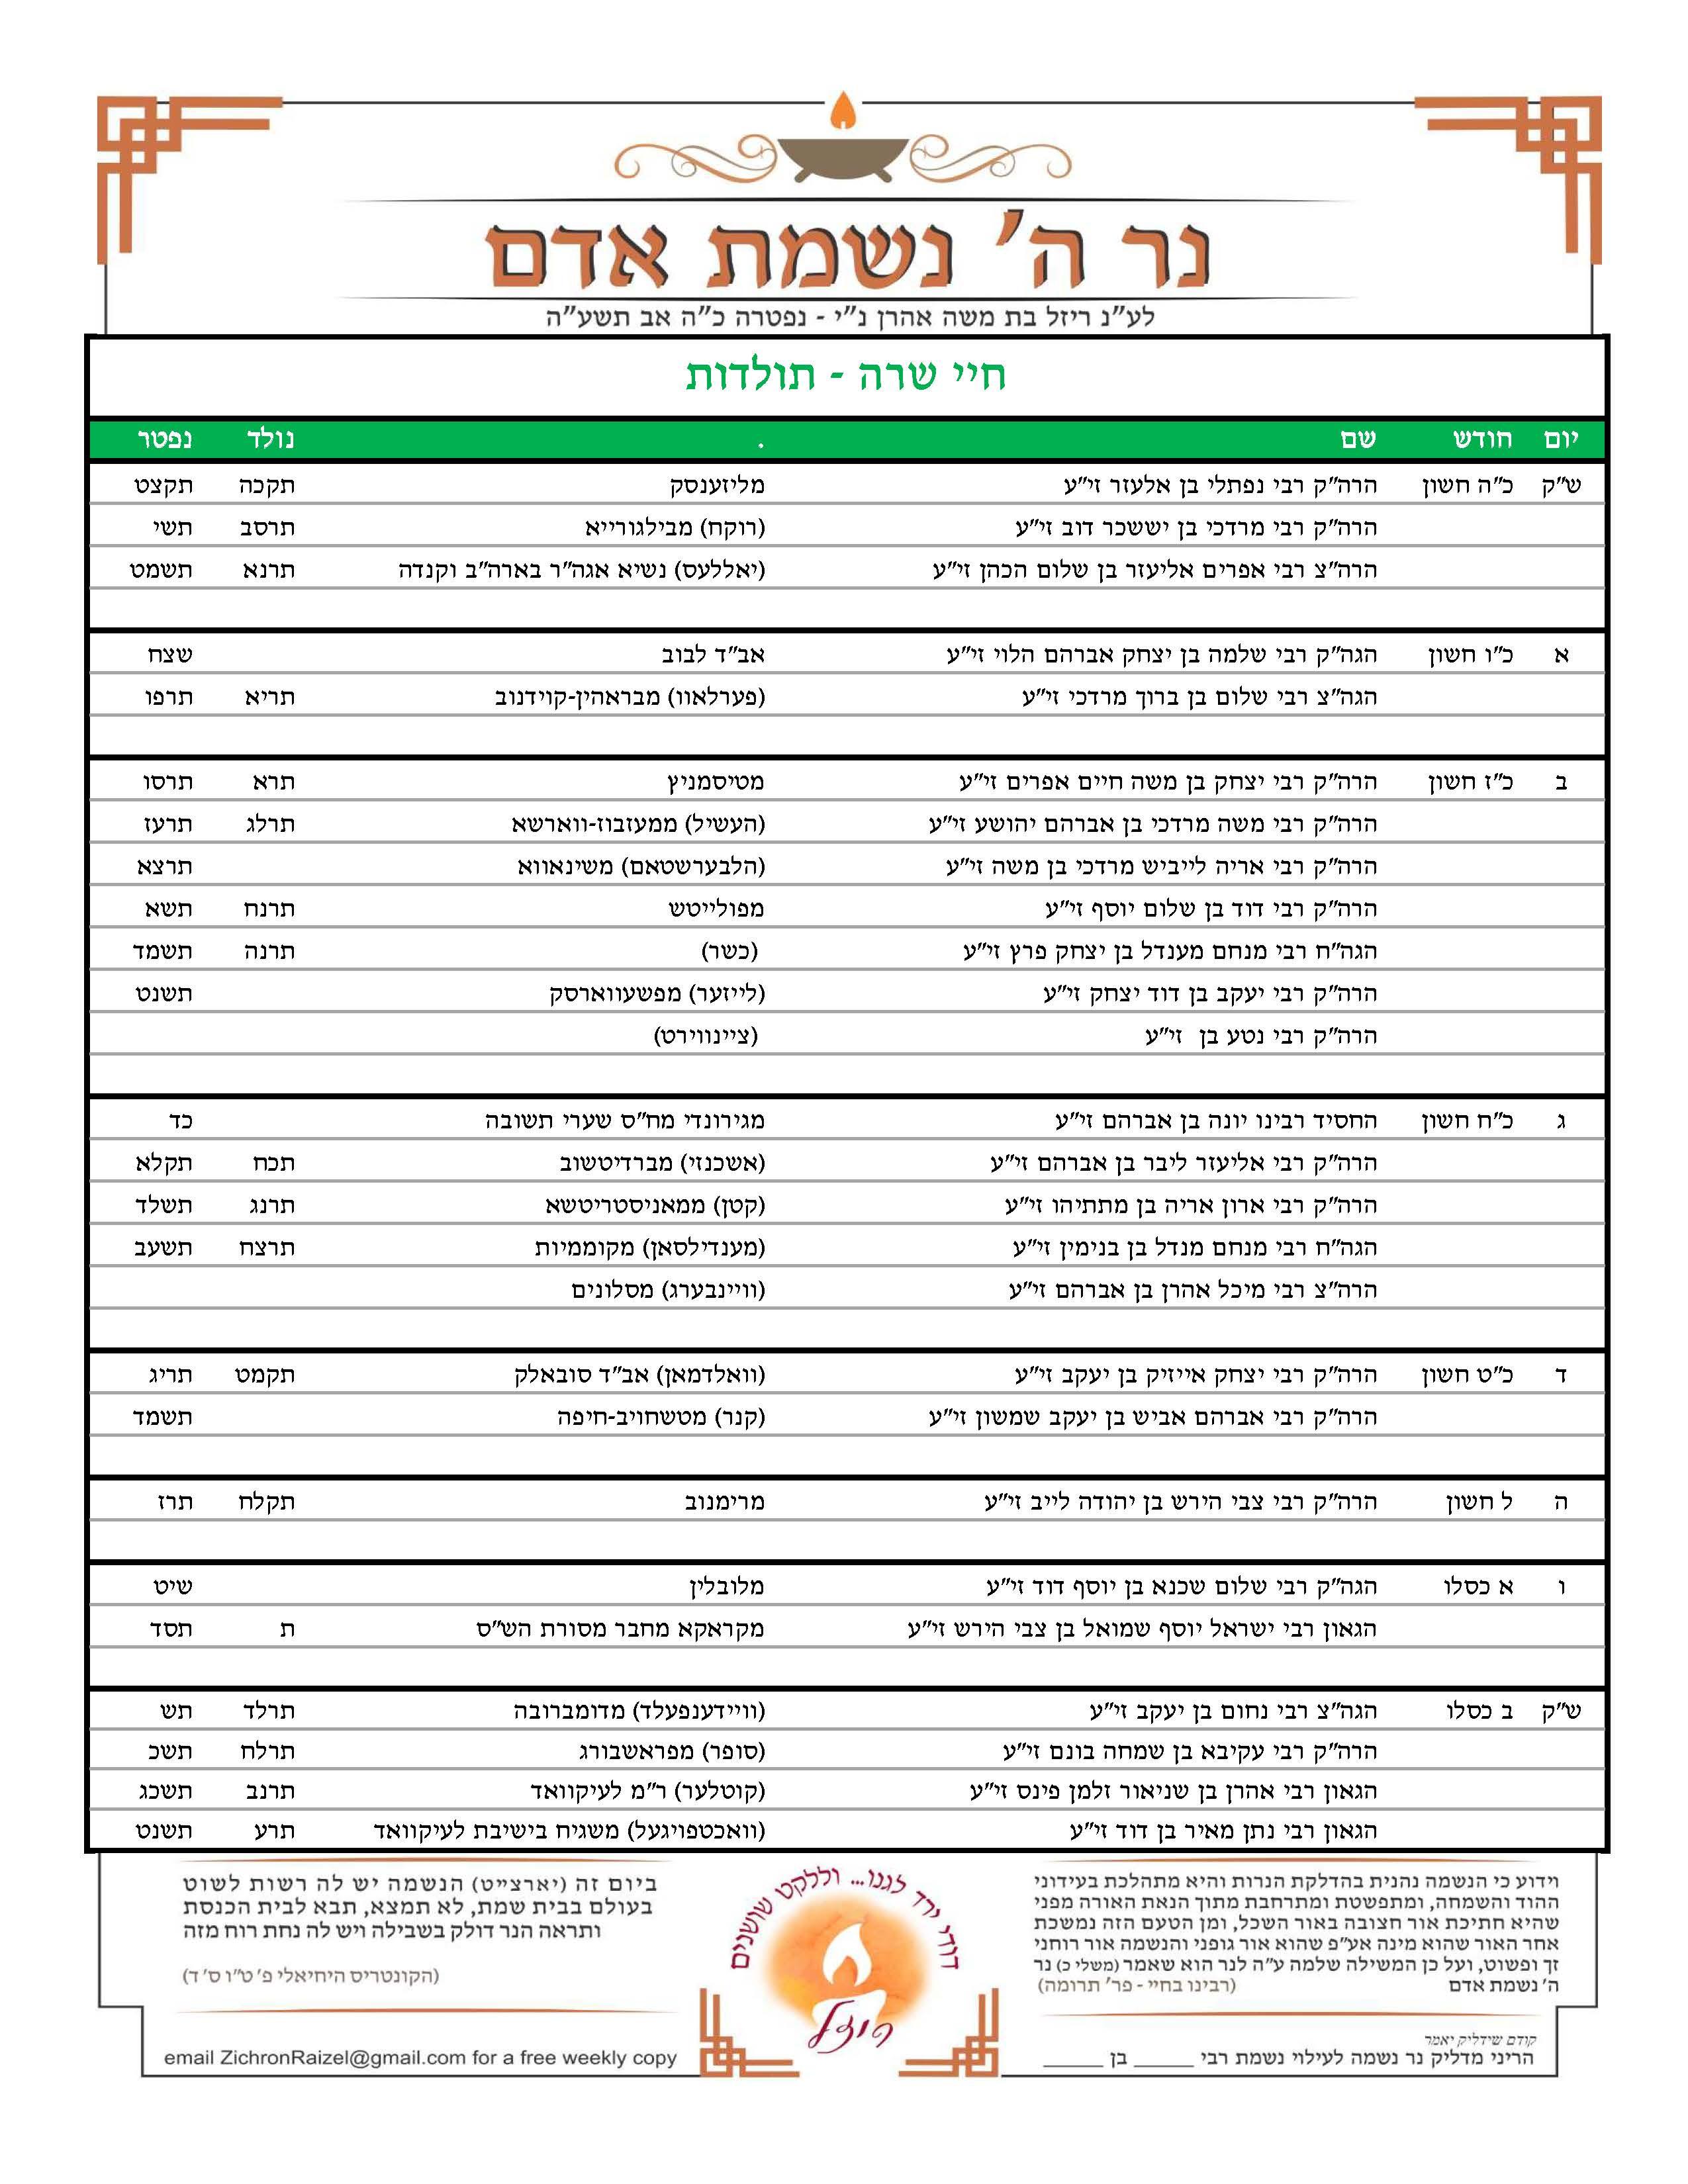 Upcoming Yahrtzeits 25 Cheshvan 2 Kislev Raa Igud Harabbonim